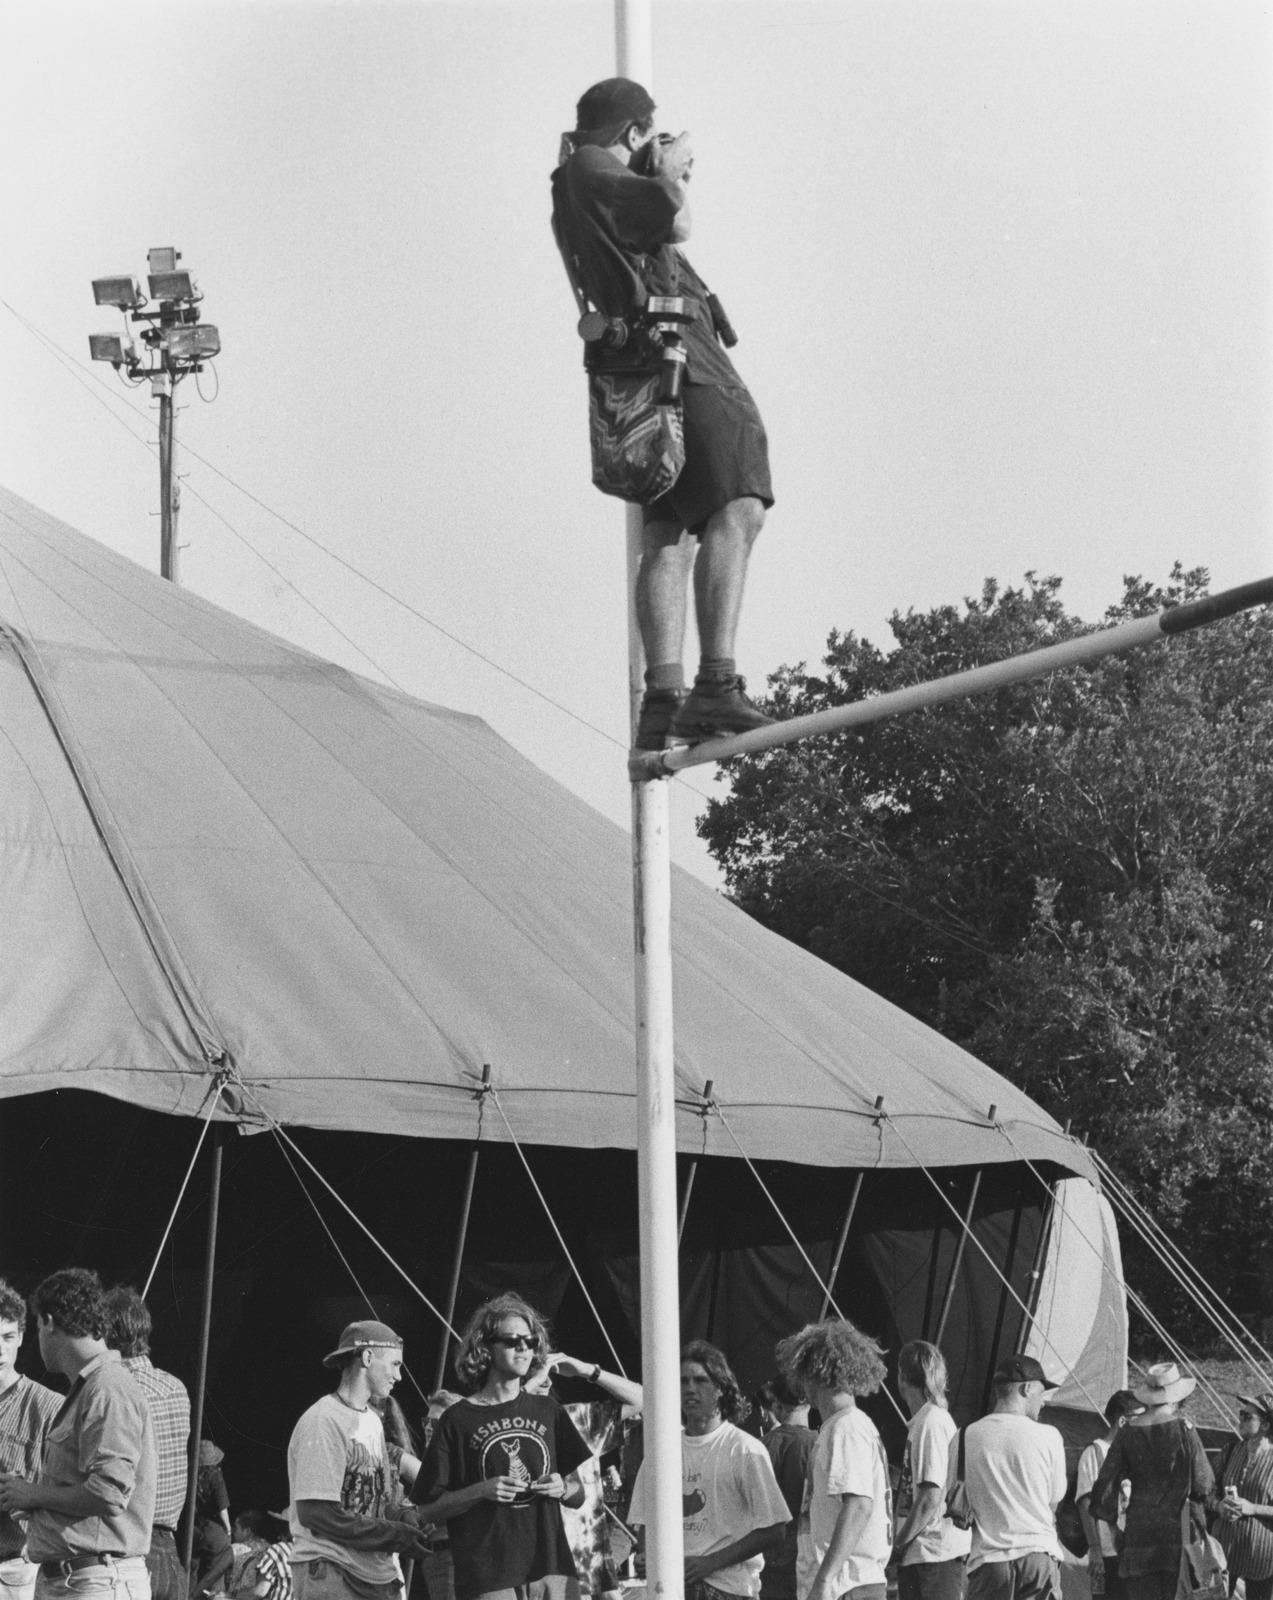 Livid music festival West End 1993 kathy dora slq